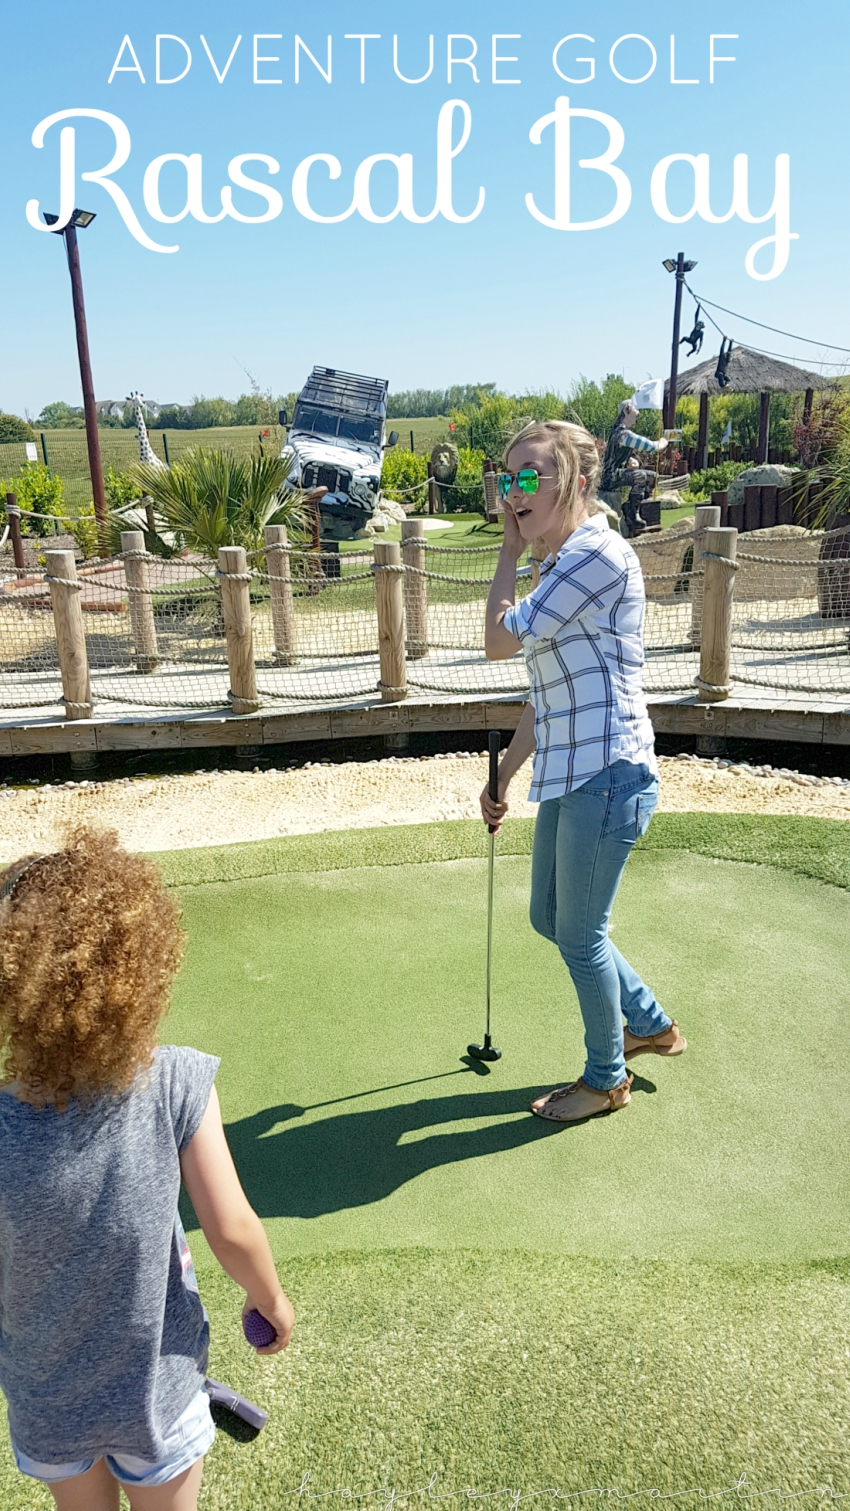 hayleyxmartin   Rascal Bay - Manston - Adventure Golf Course